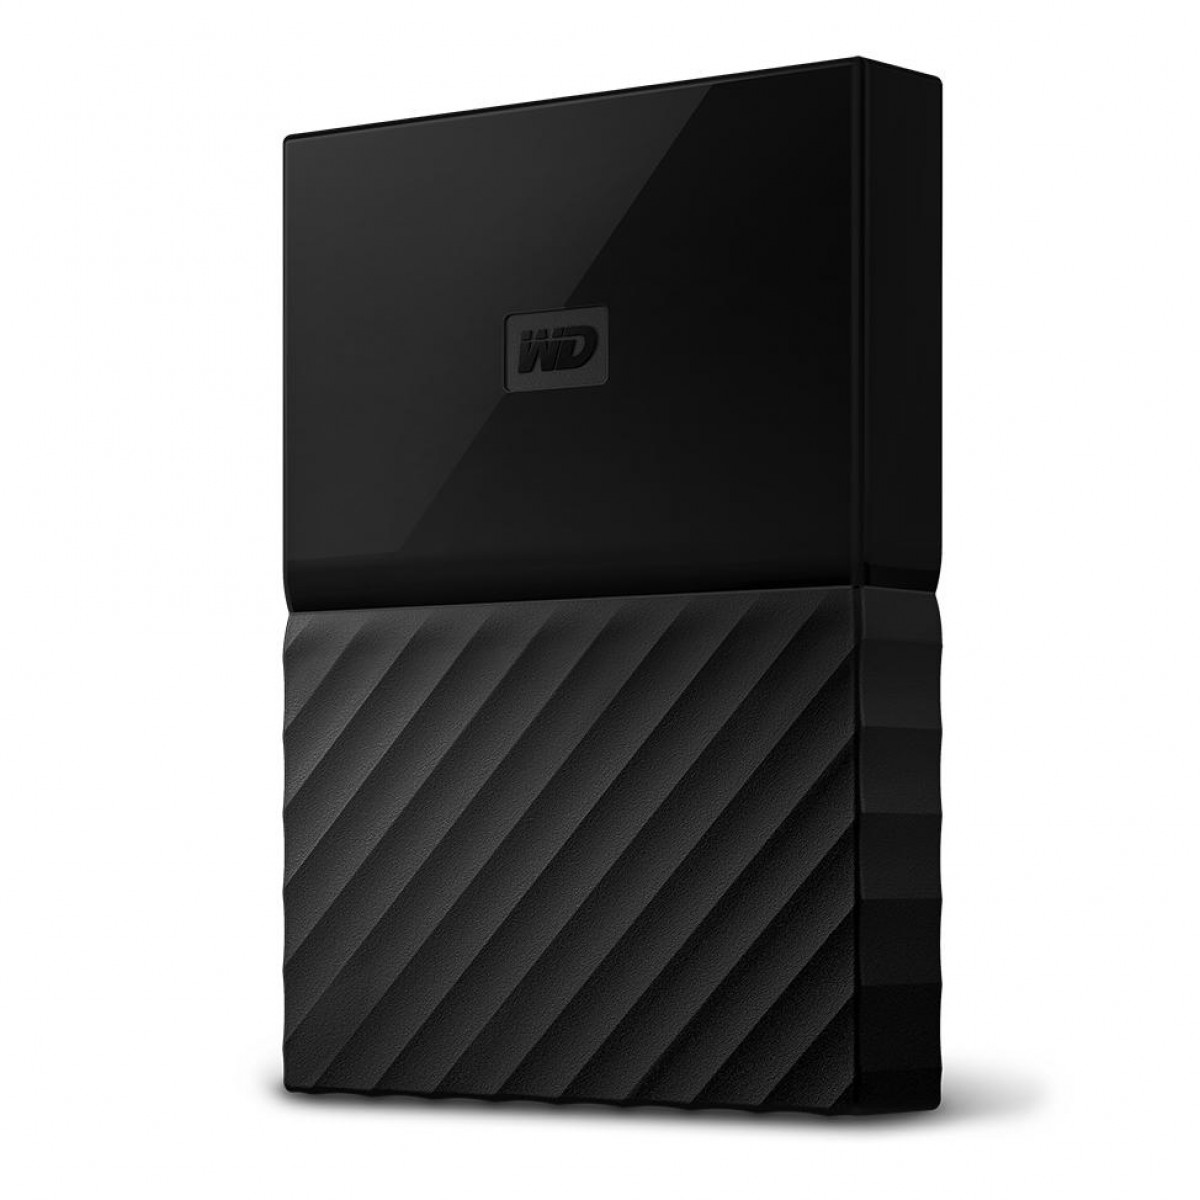 Western Digital My passport 2TB Type-C USB For Mac - Black